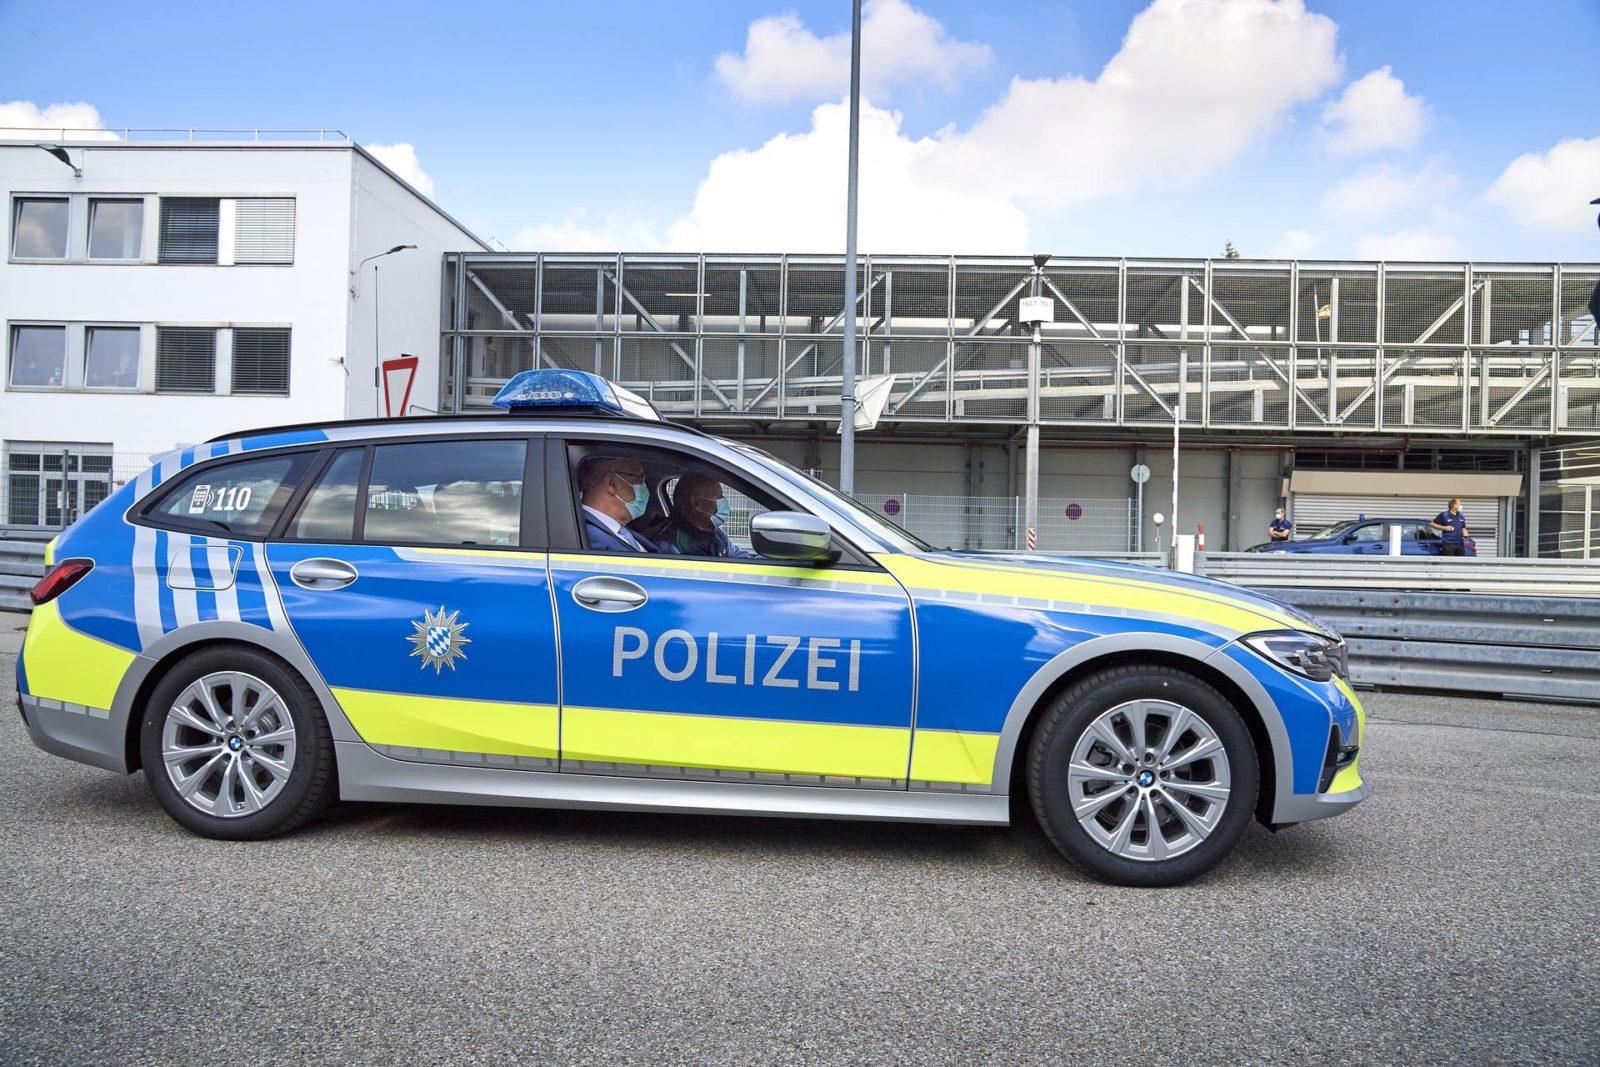 bavaria-police-bmw-3-series-touring